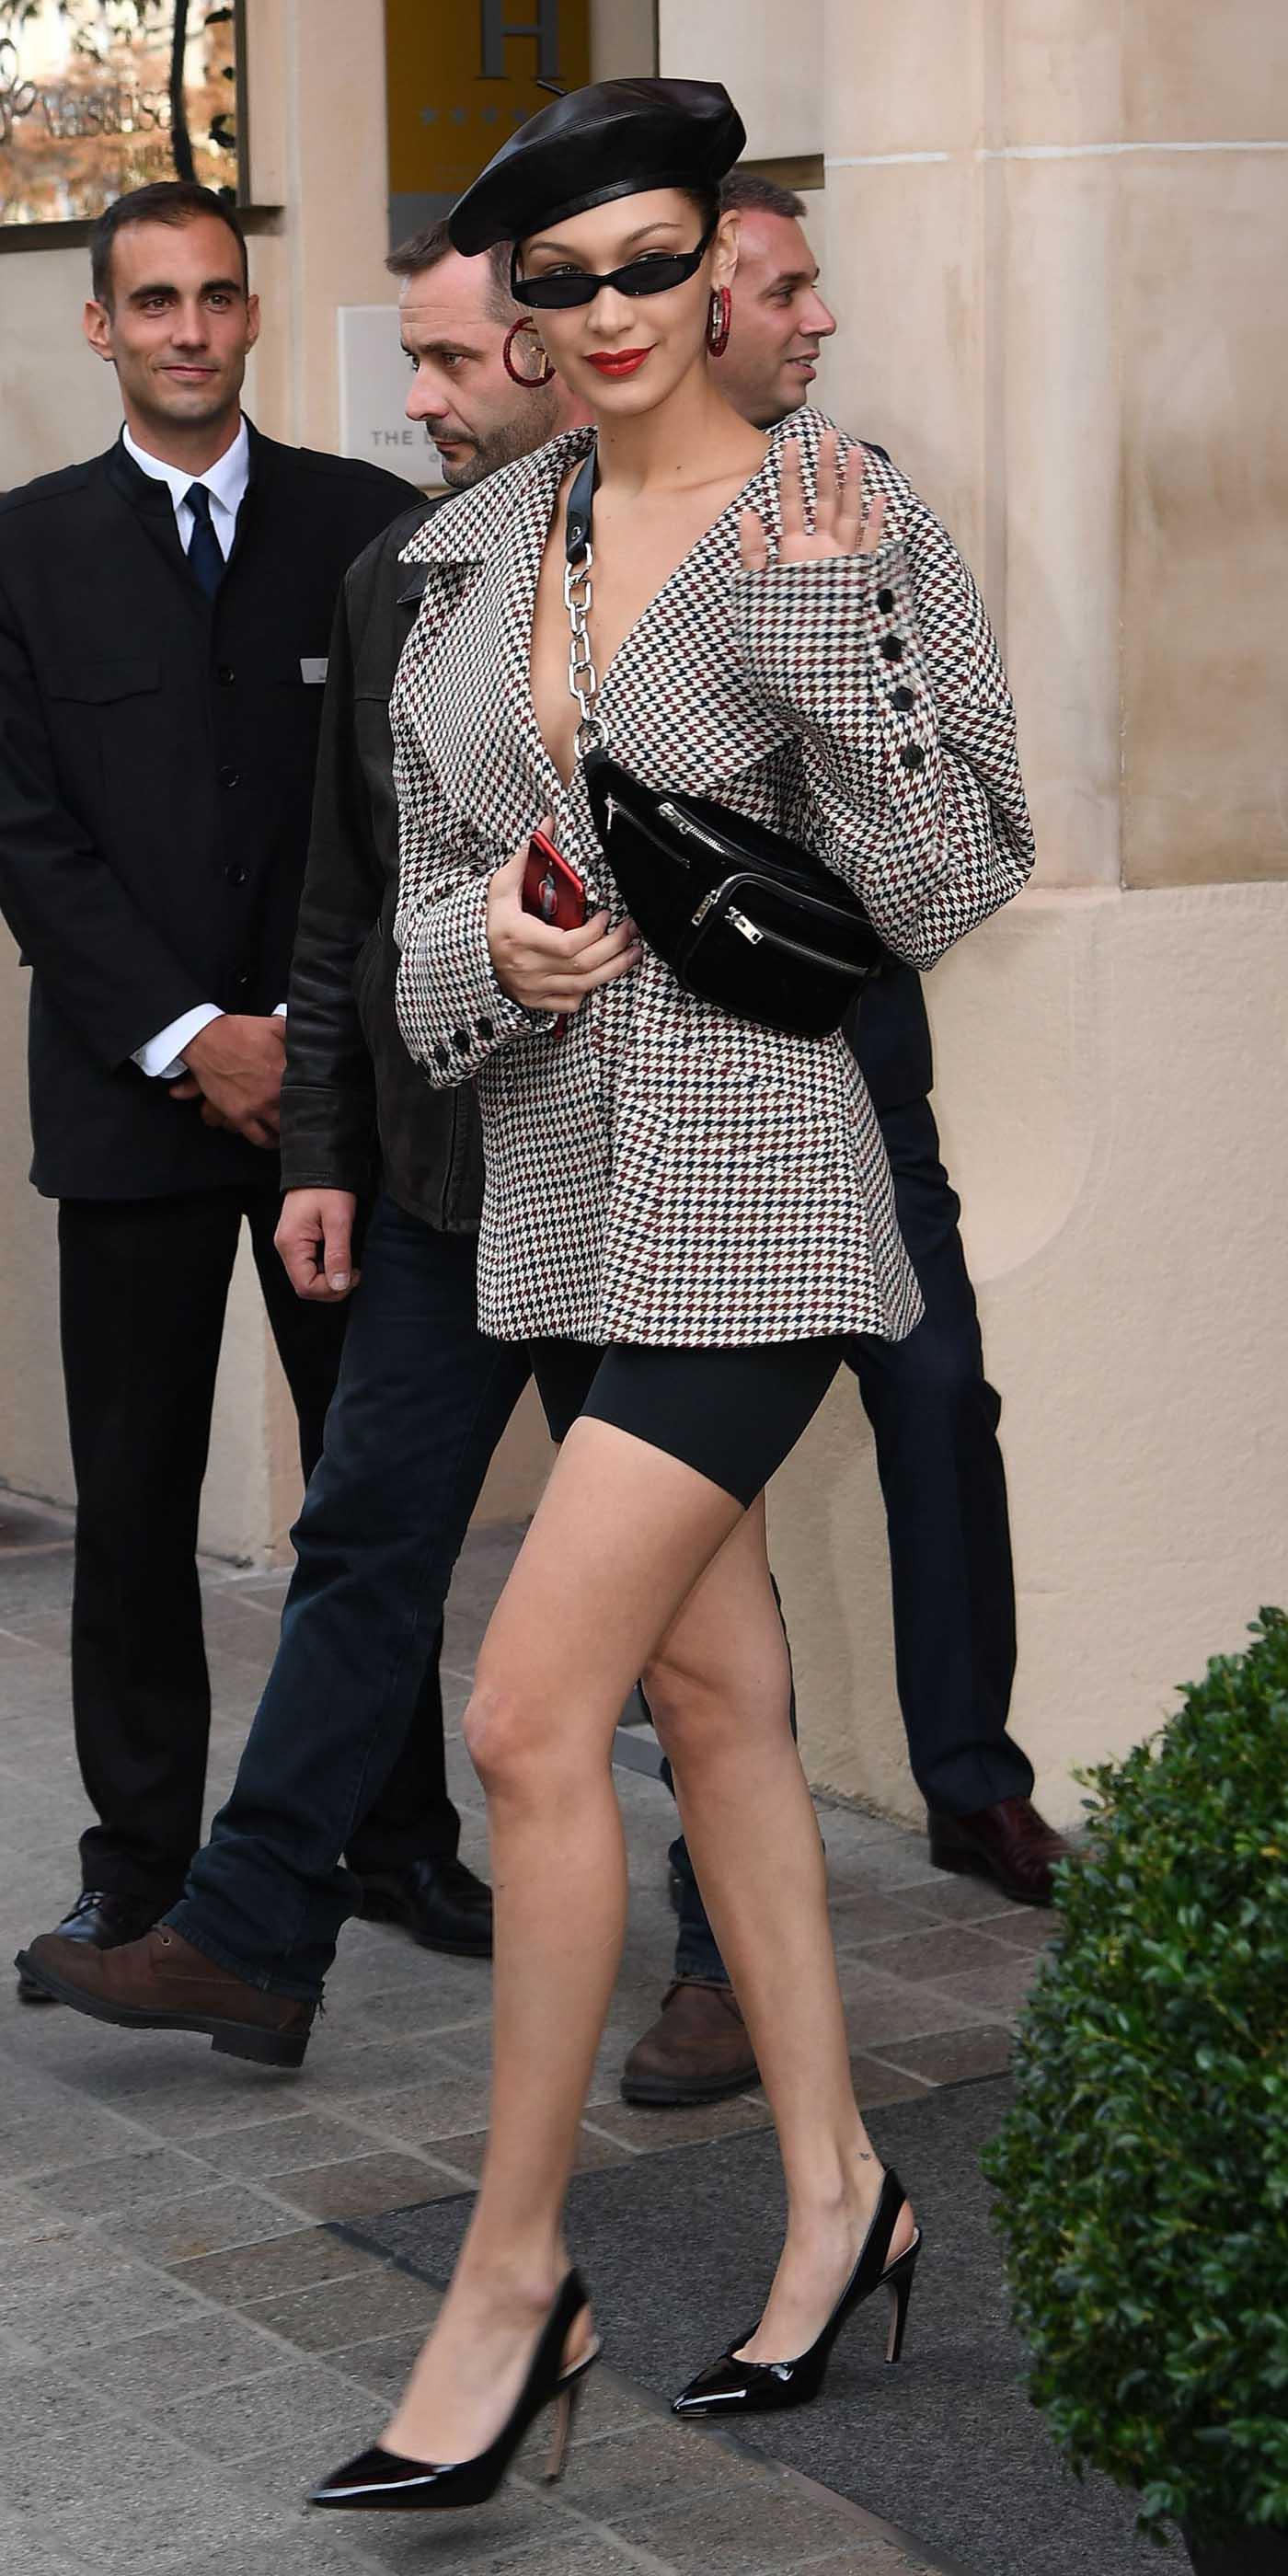 black-shorts-cycling-bike-white-jacket-blazer-houndstooth-print-sun-hat-beret-black-bag-fannypack-black-shoe-pumps-hoops-bellahadid-celebrity-style-fall-winter-lunch.jpg